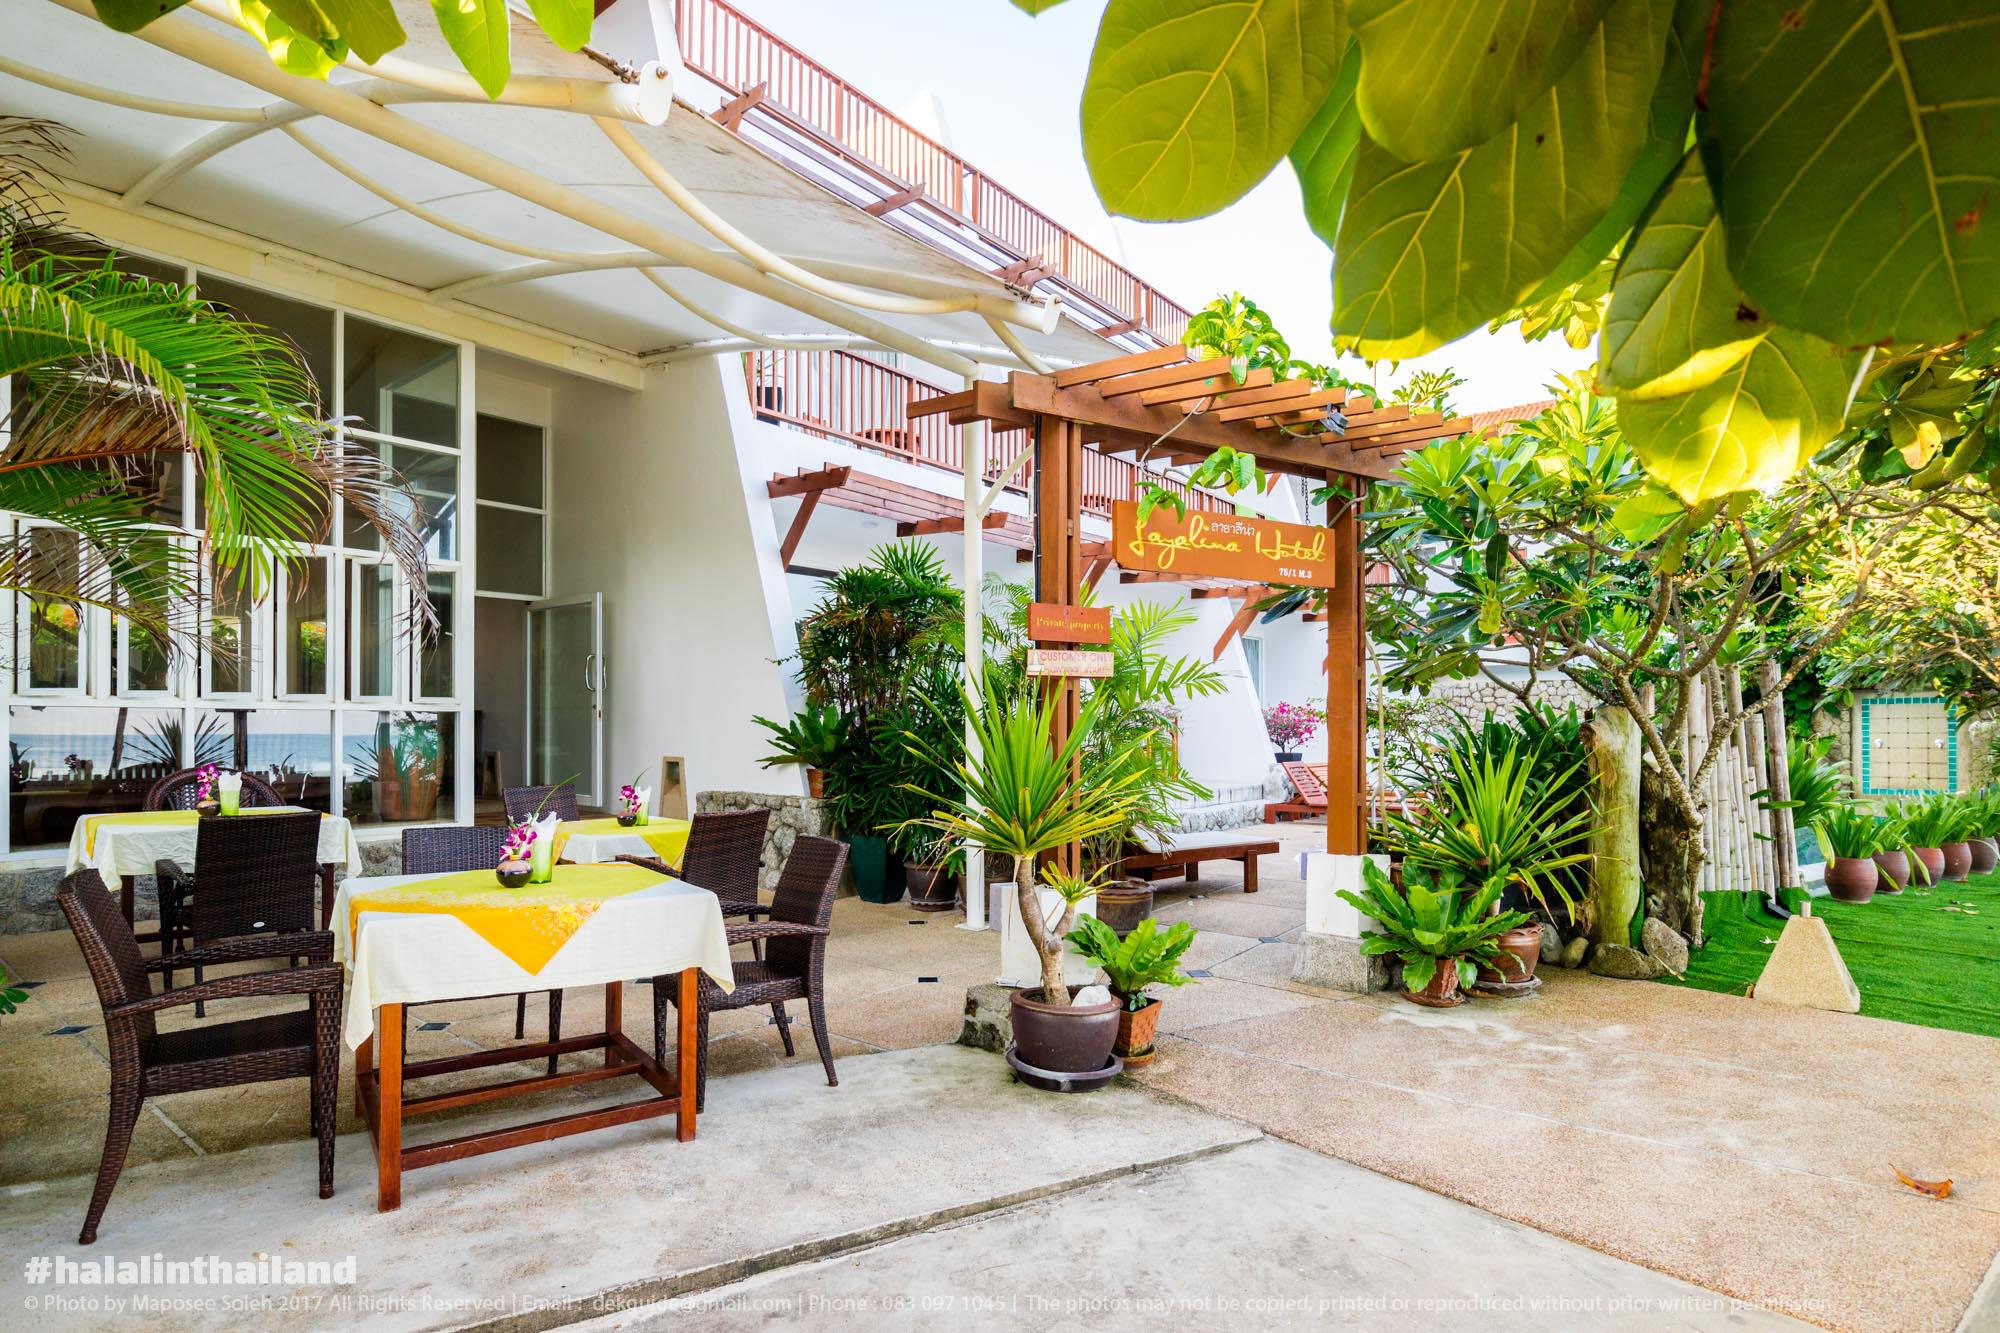 Layalina Halal Hotel Phuket